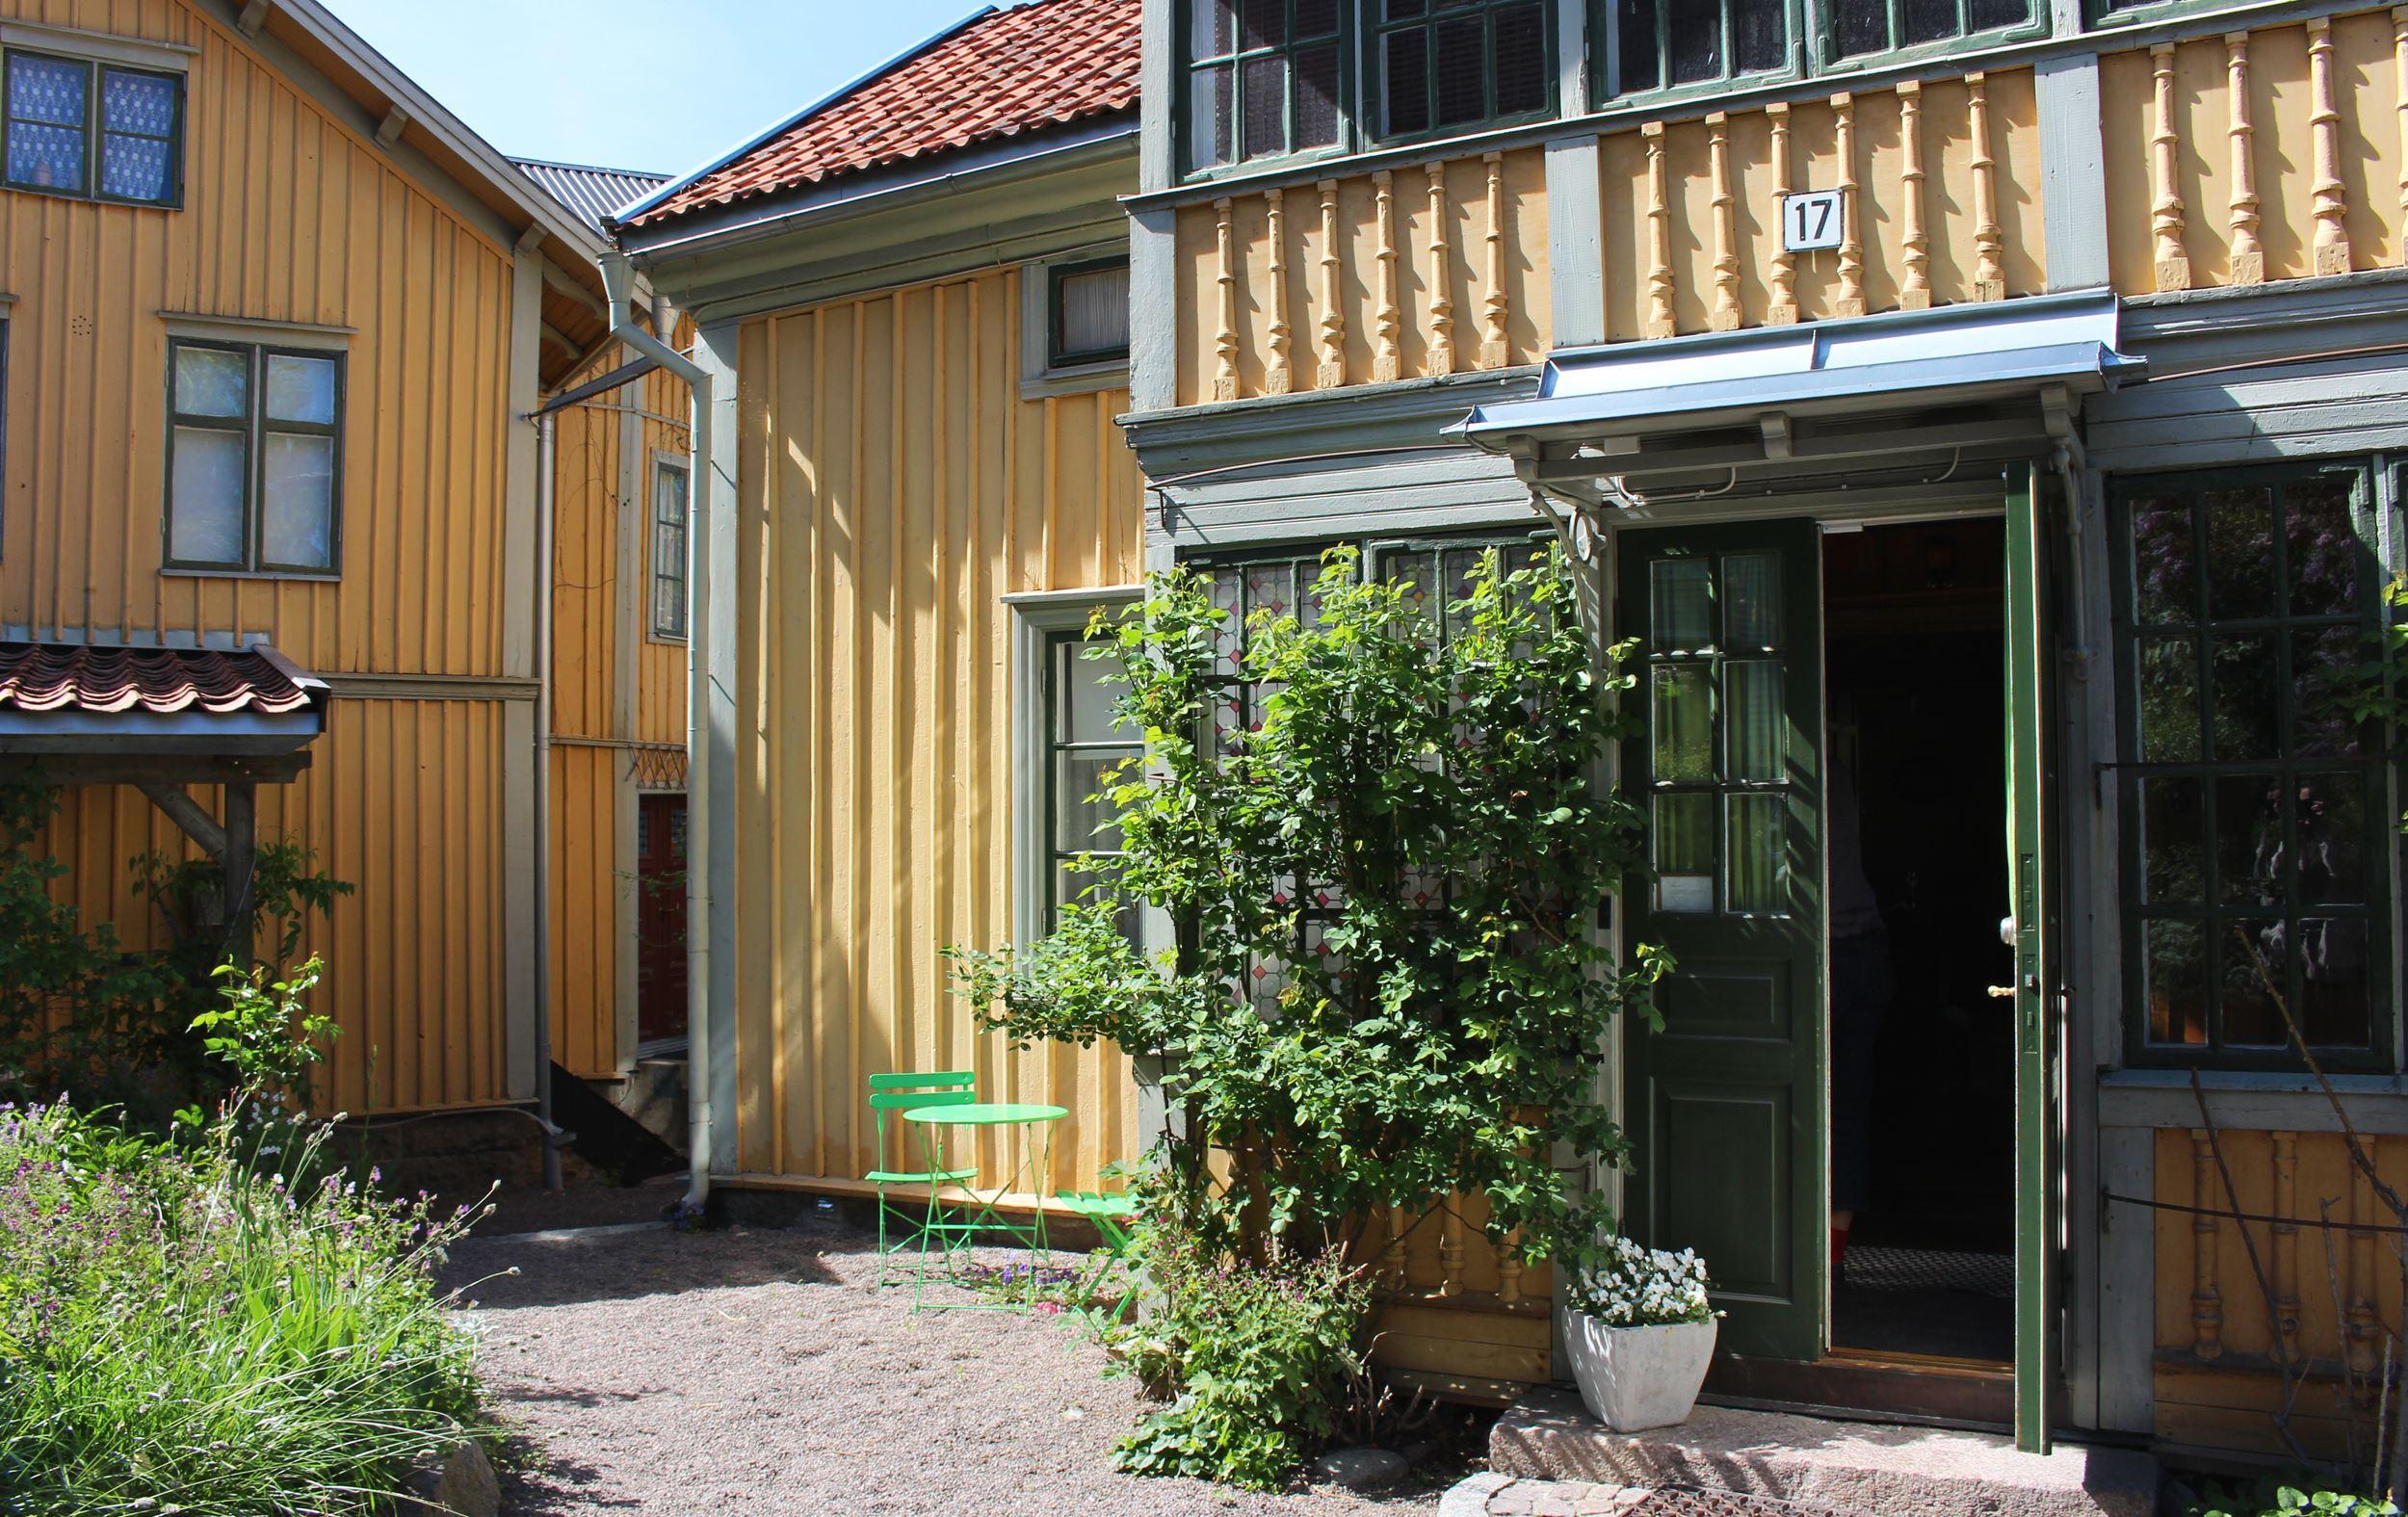 O:115 Mariedahl, Rönnbärsgatan 17